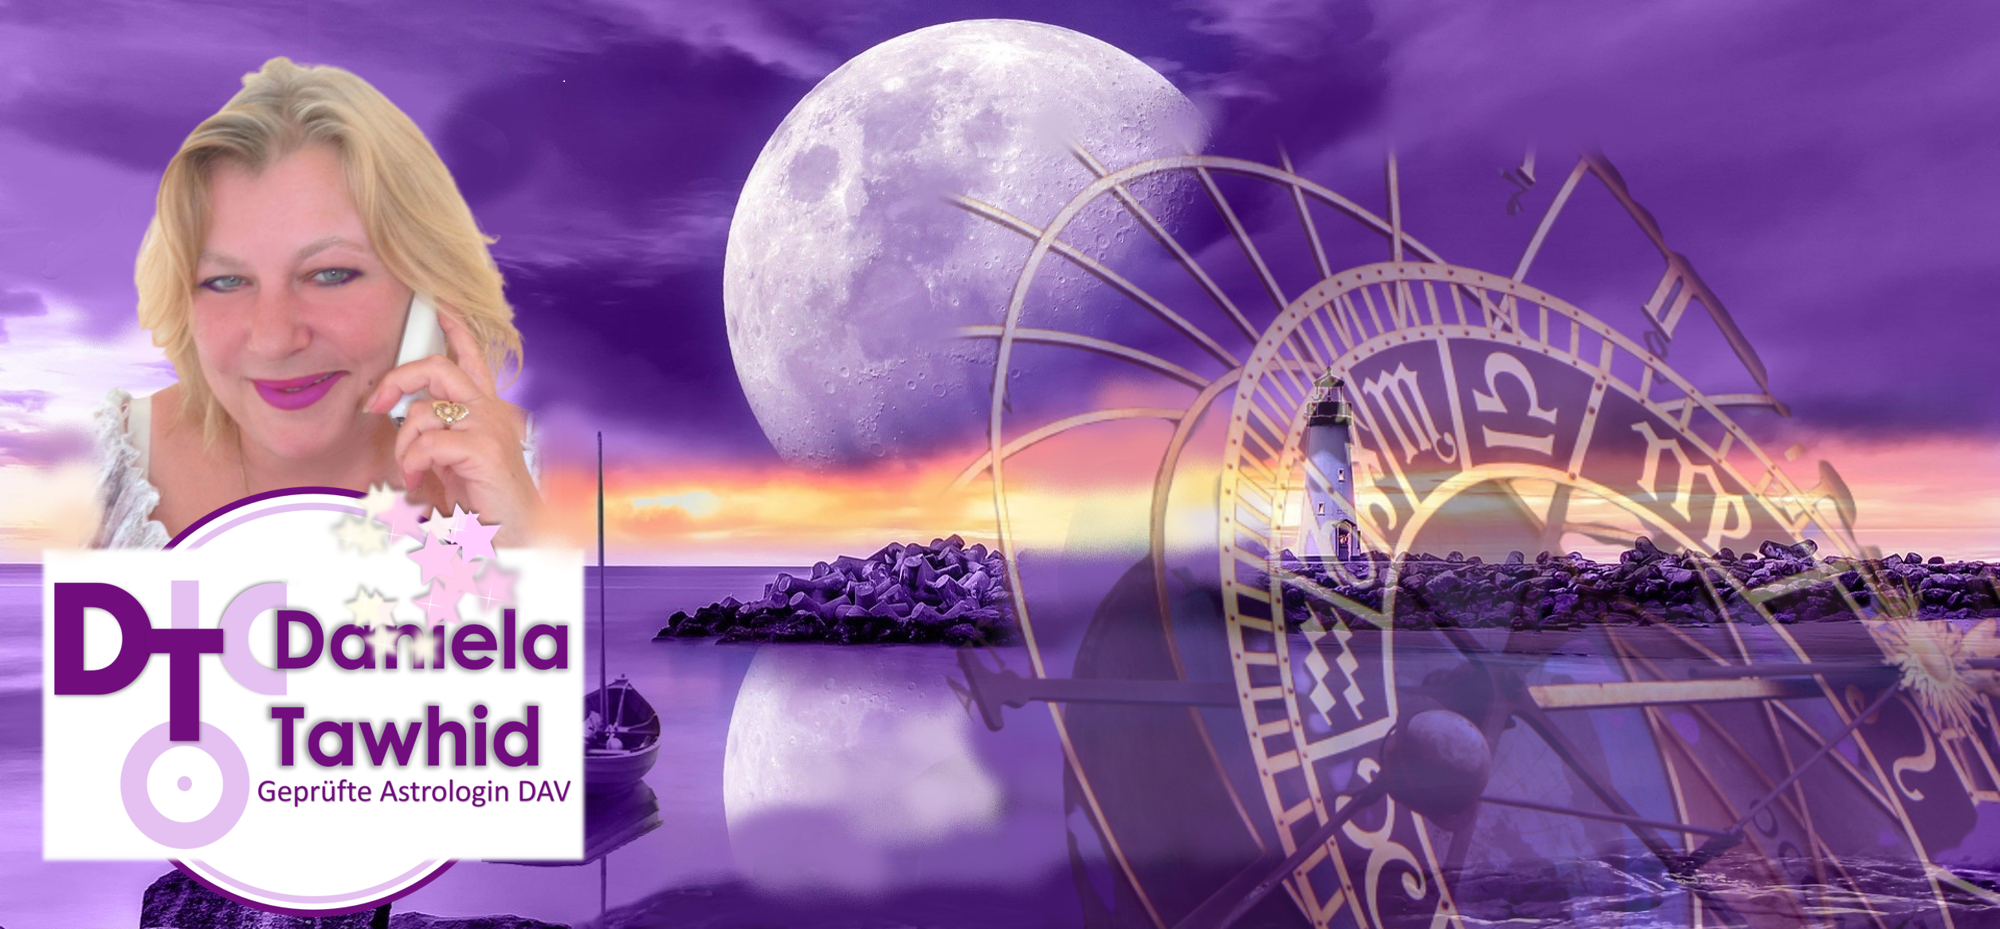 Astrologie-Heilbronn, Daniela Tawhid, geprüfte Astrologin DAV – Tel: 07066-912018